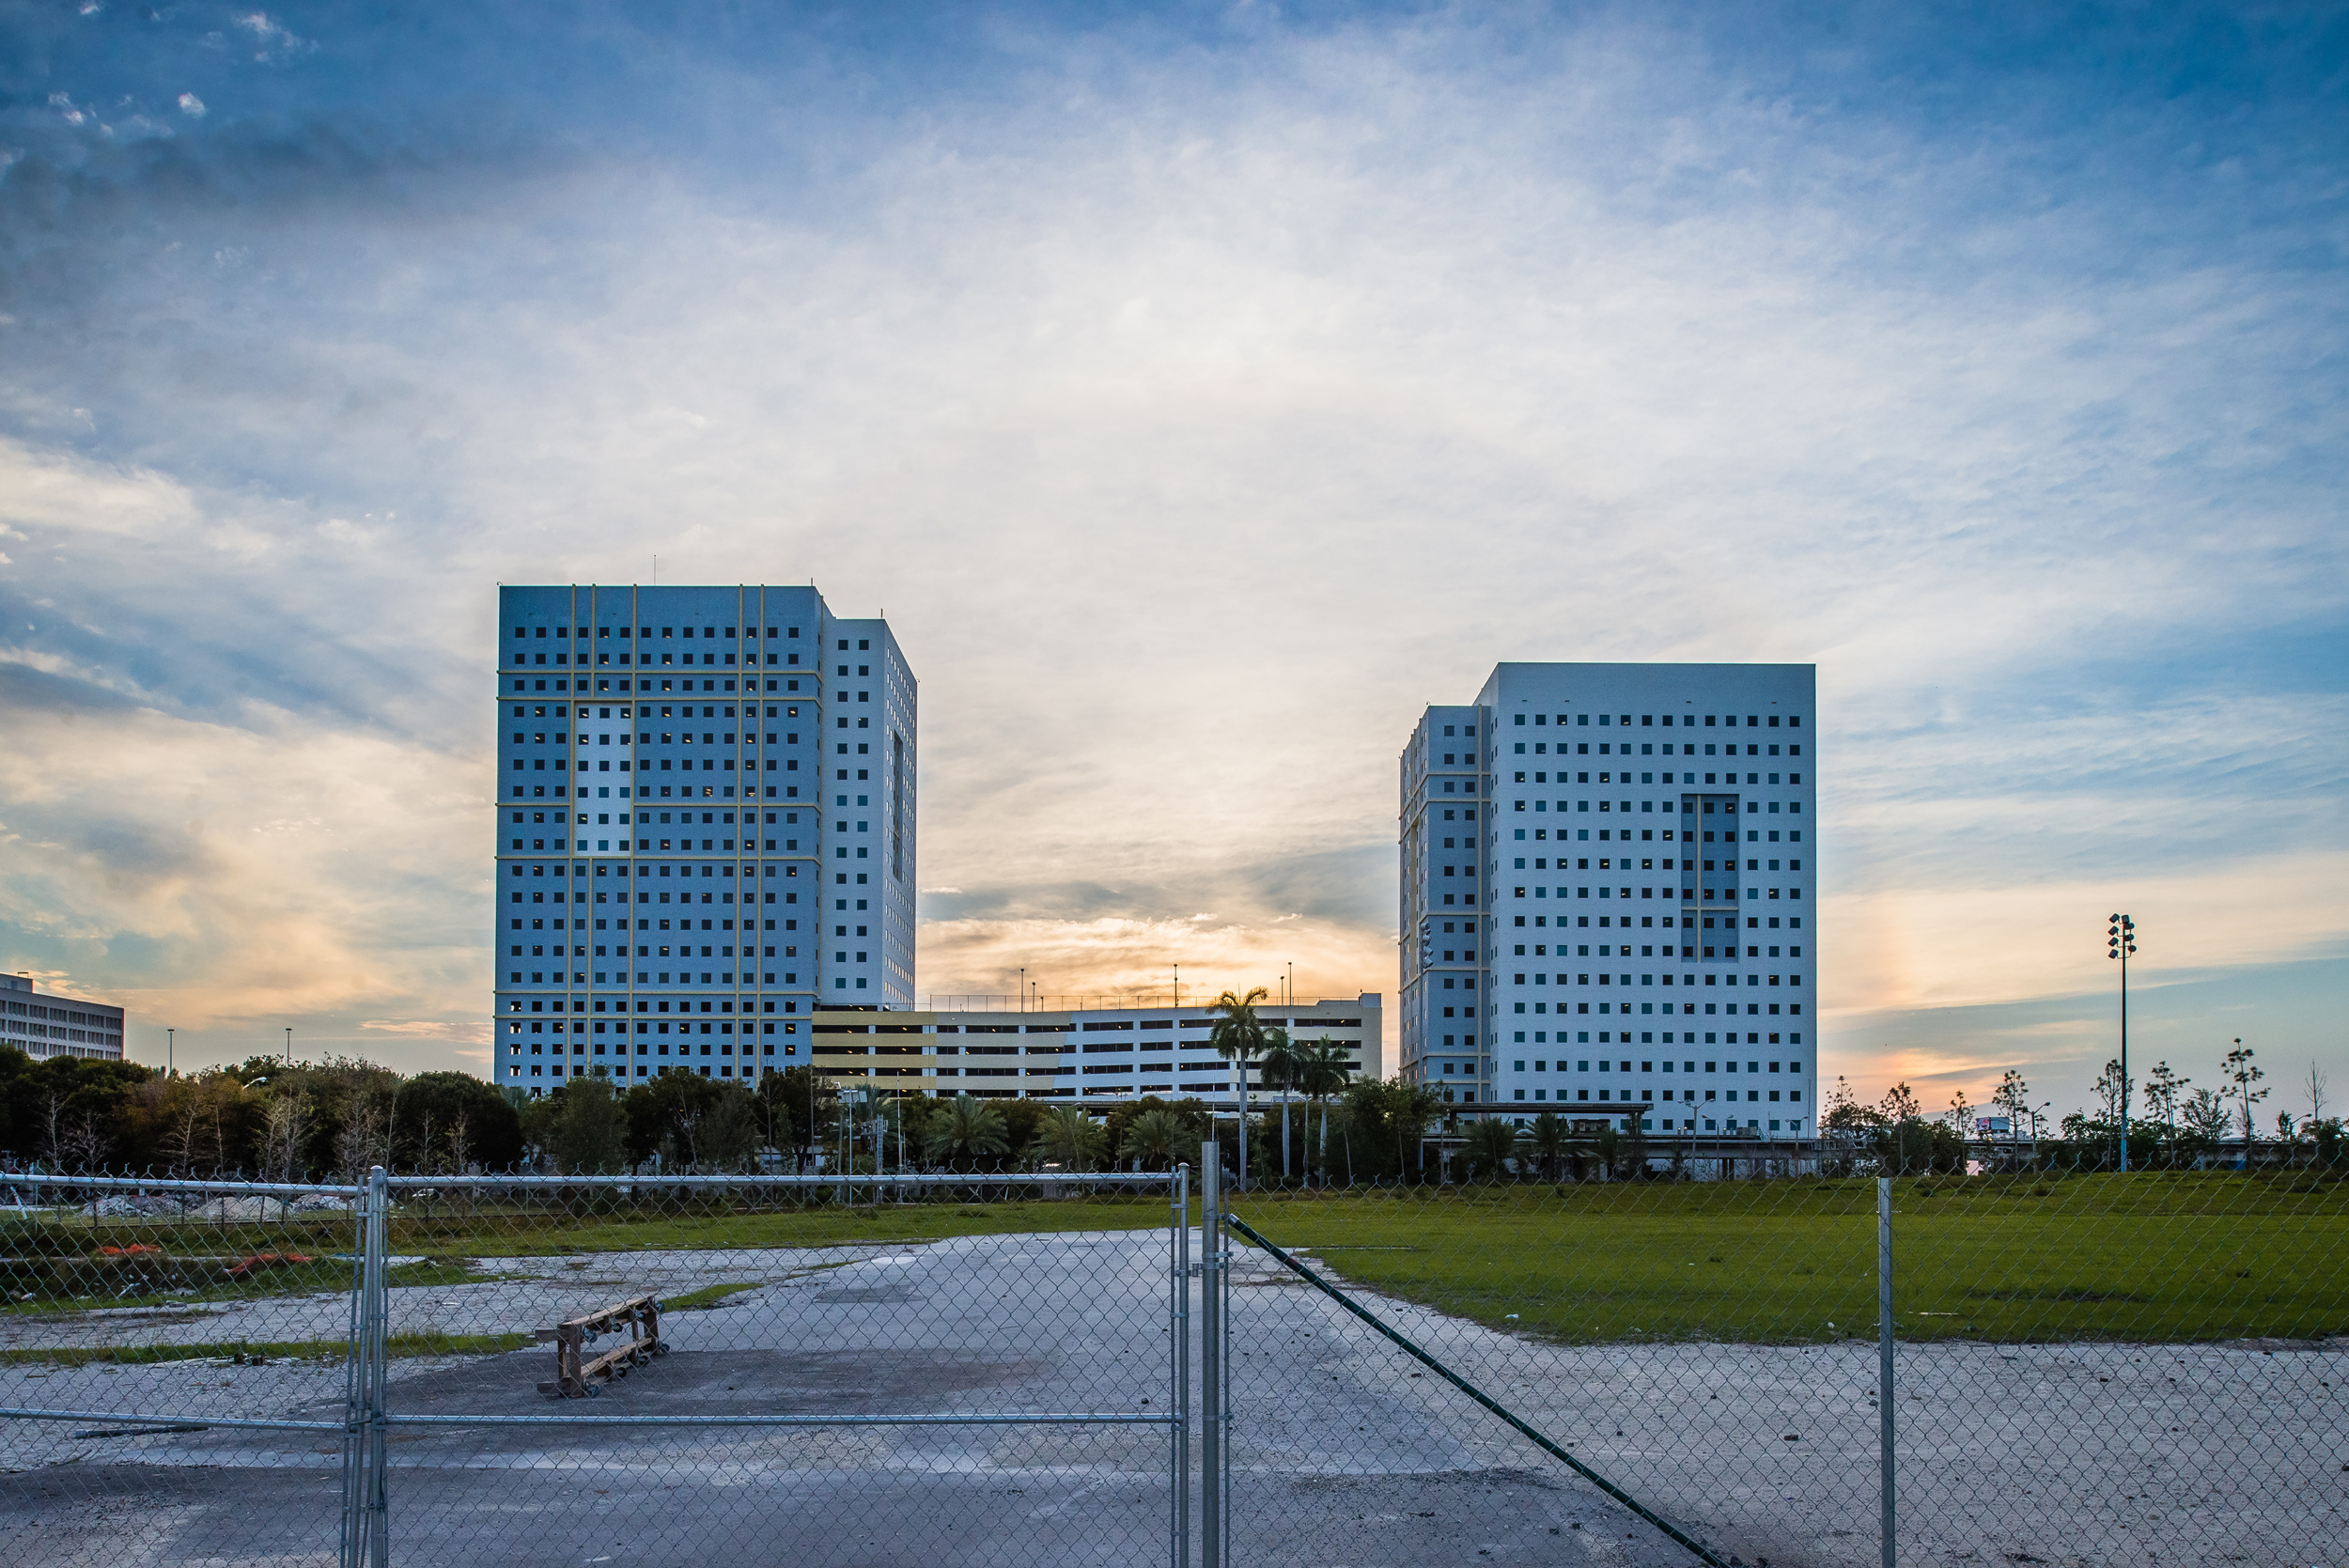 Miami-Dade County Public Housing and Community Development